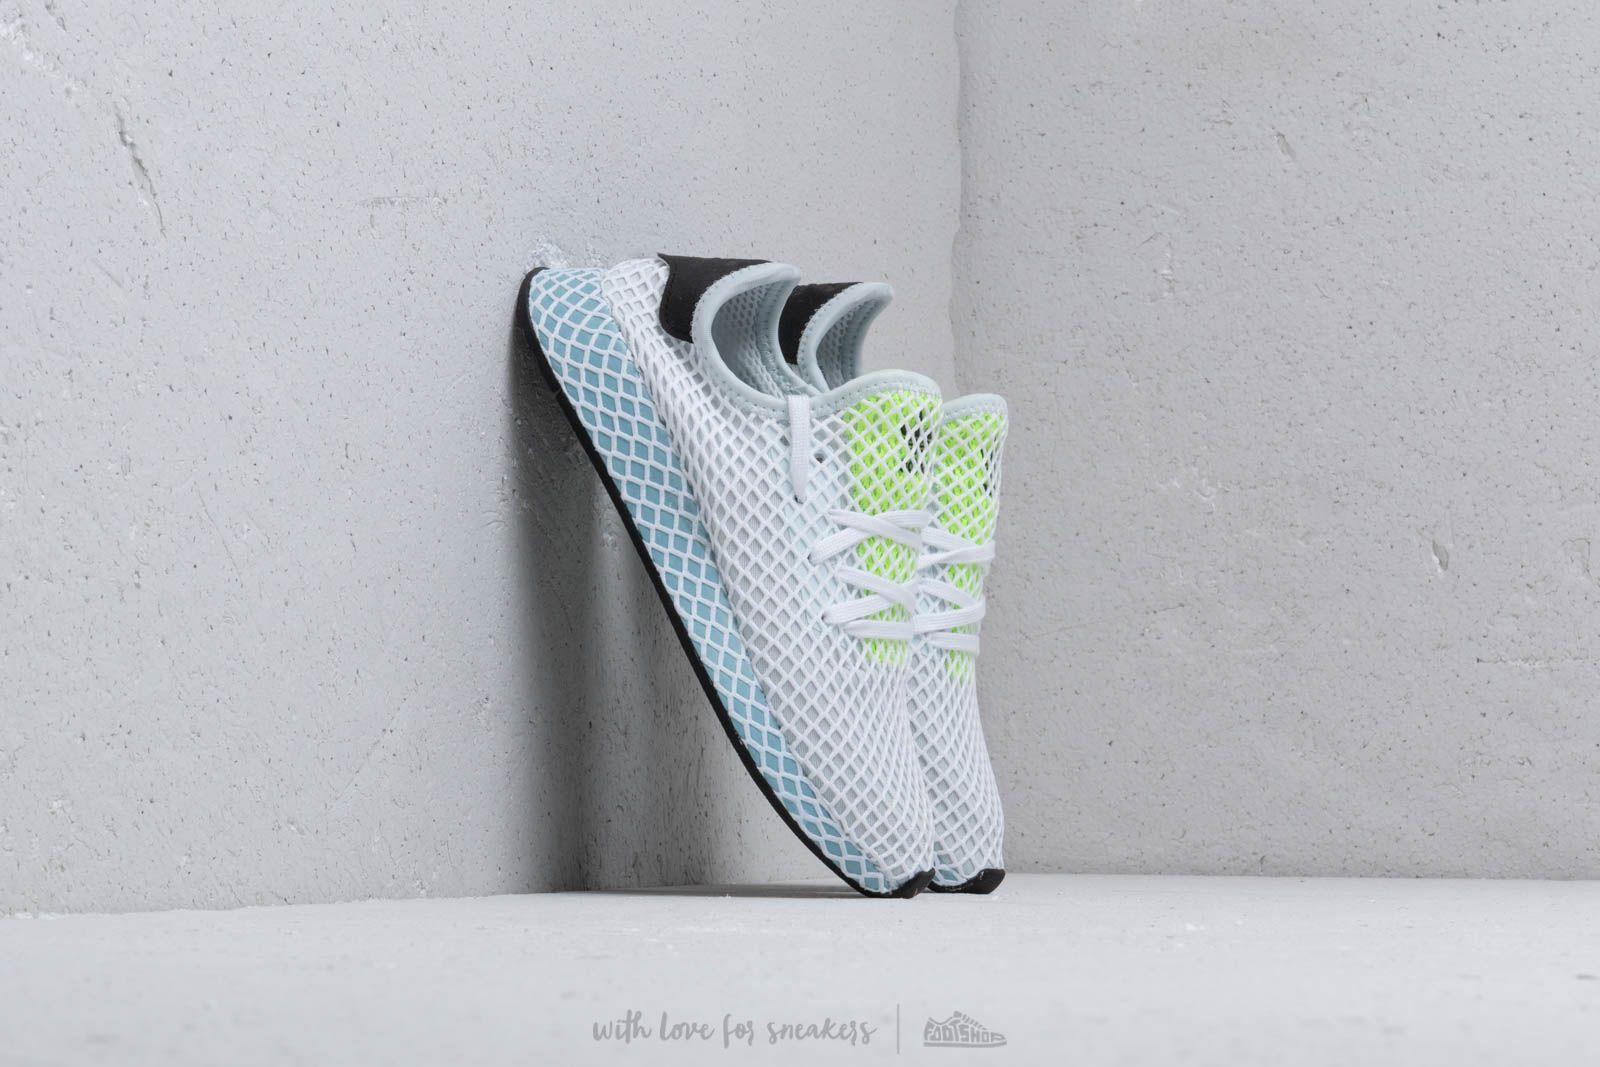 2dbbb00becc73 adidas Deerupt Runner W Blutin  Ashgre  Hireye at a great price 92 € buy